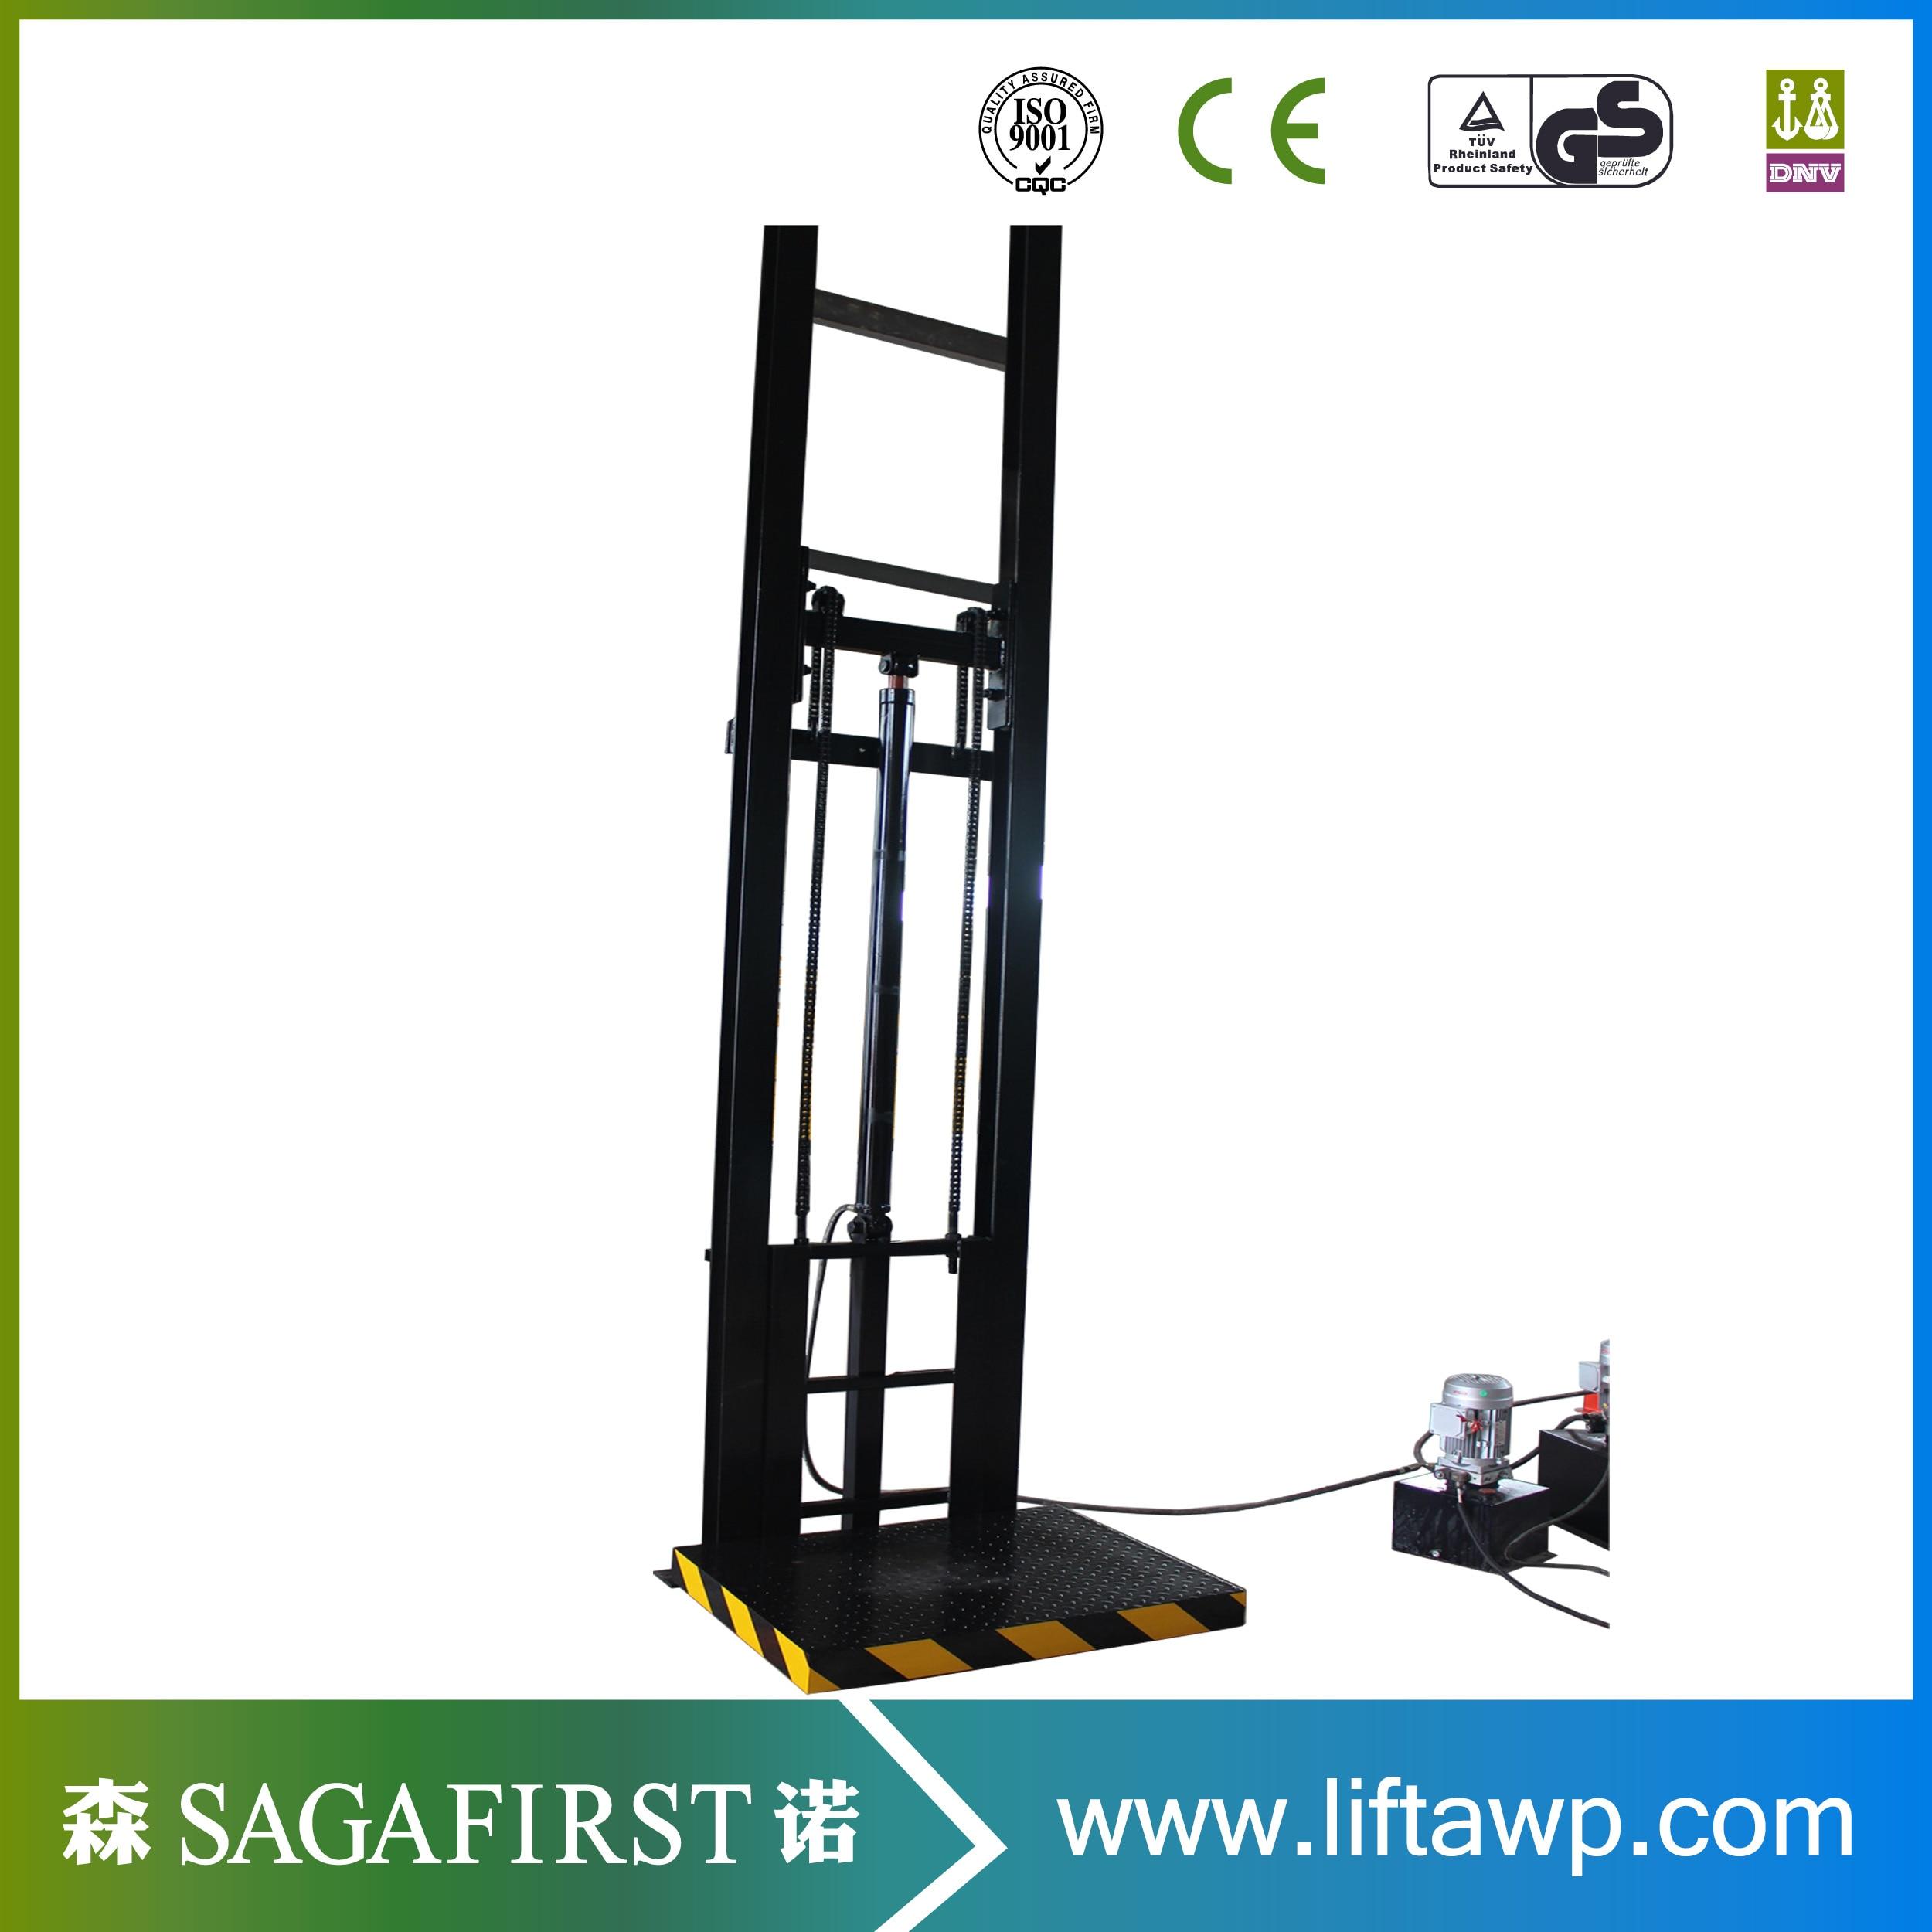 3m 5m Warehouse Hydraulic Lift Platform Vertical Goods Lift Elevator